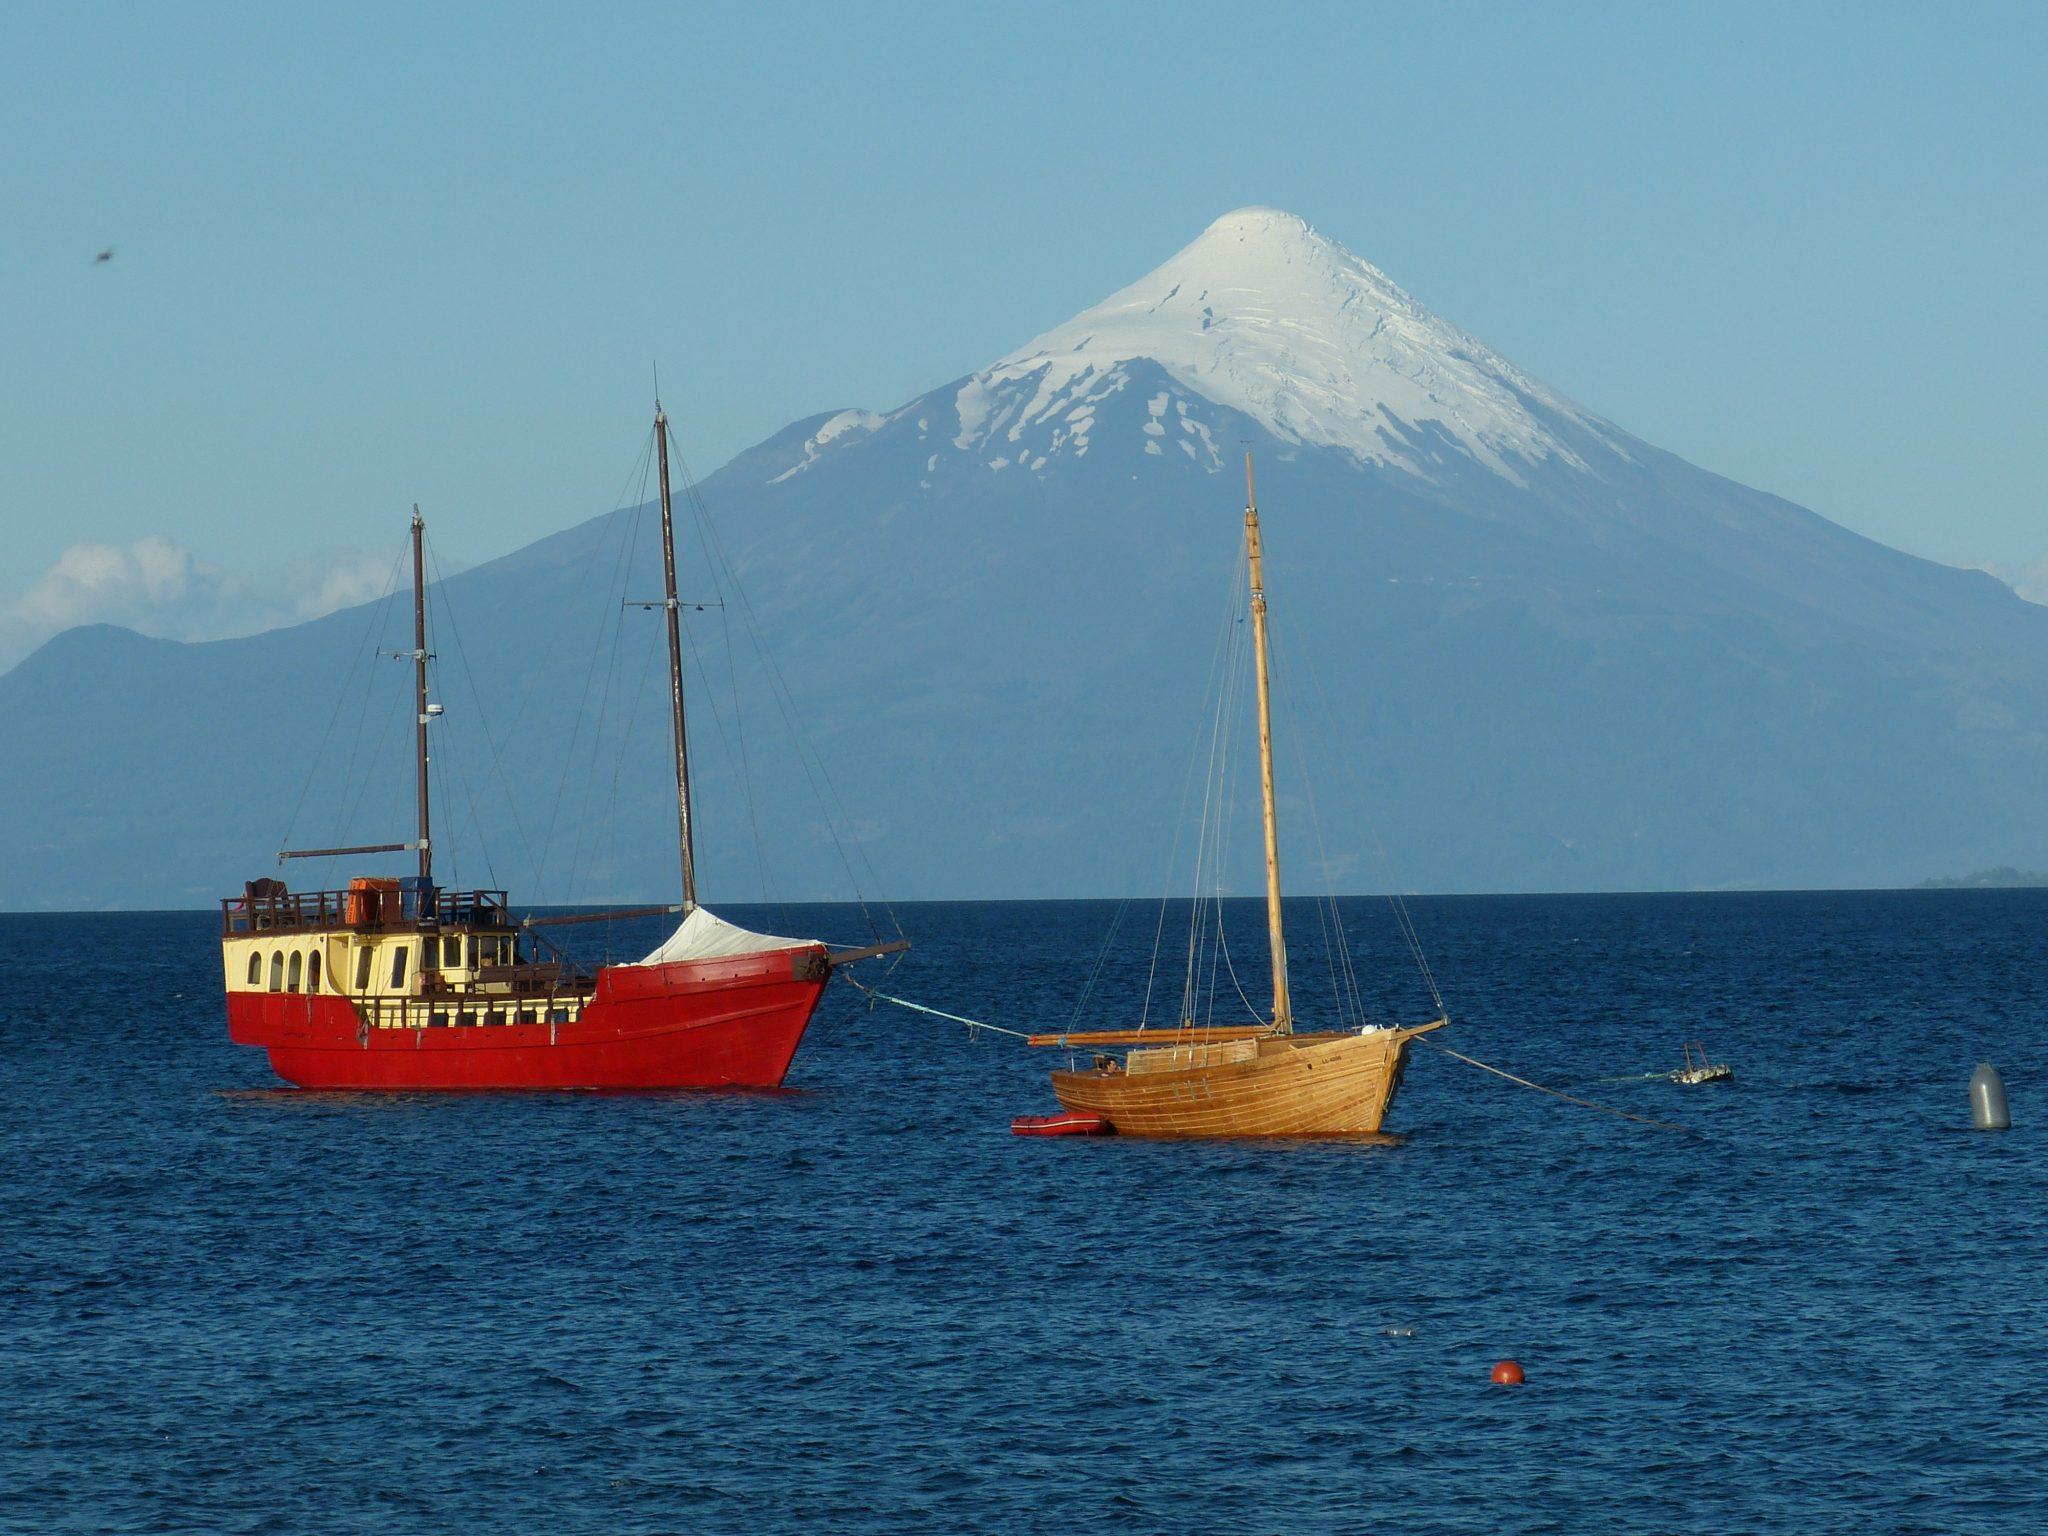 Chile_South America_Puerto Varas_PD